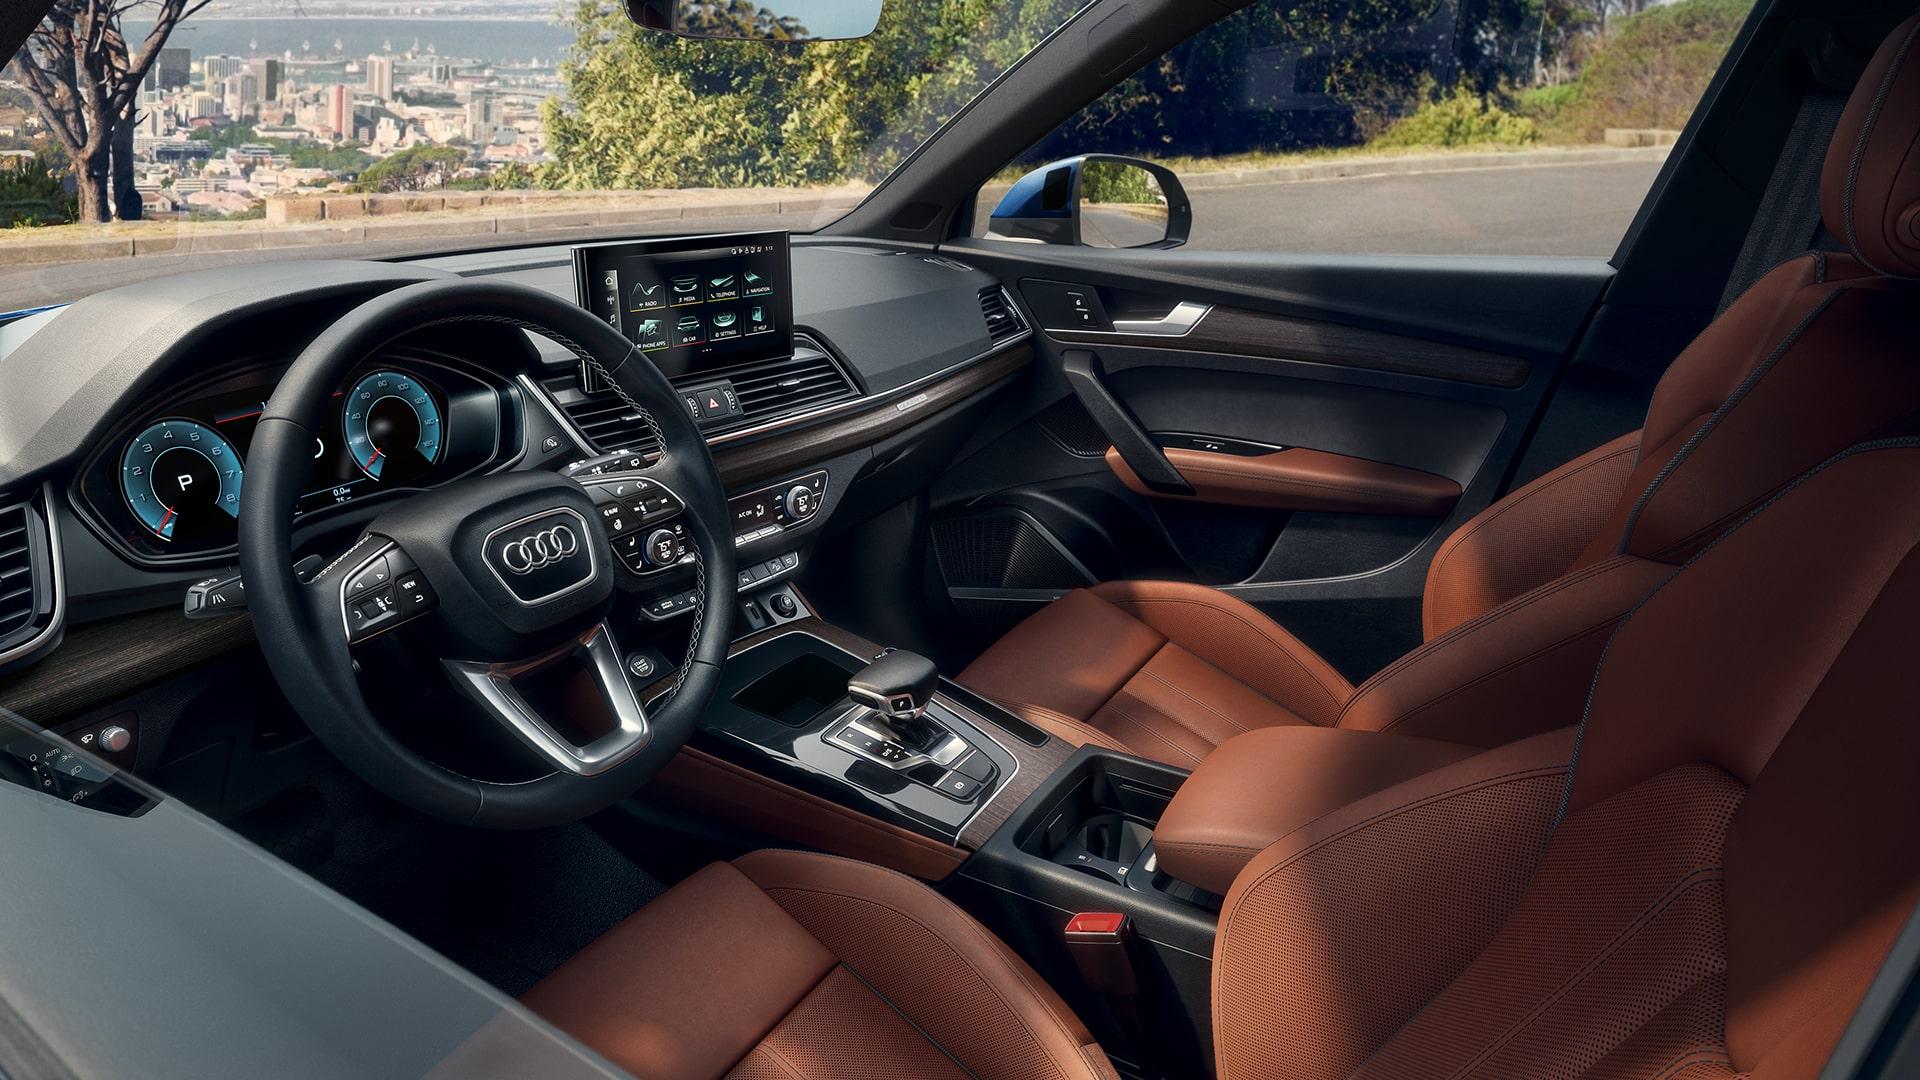 Kelebihan Kekurangan Audi 15 Murah Berkualitas